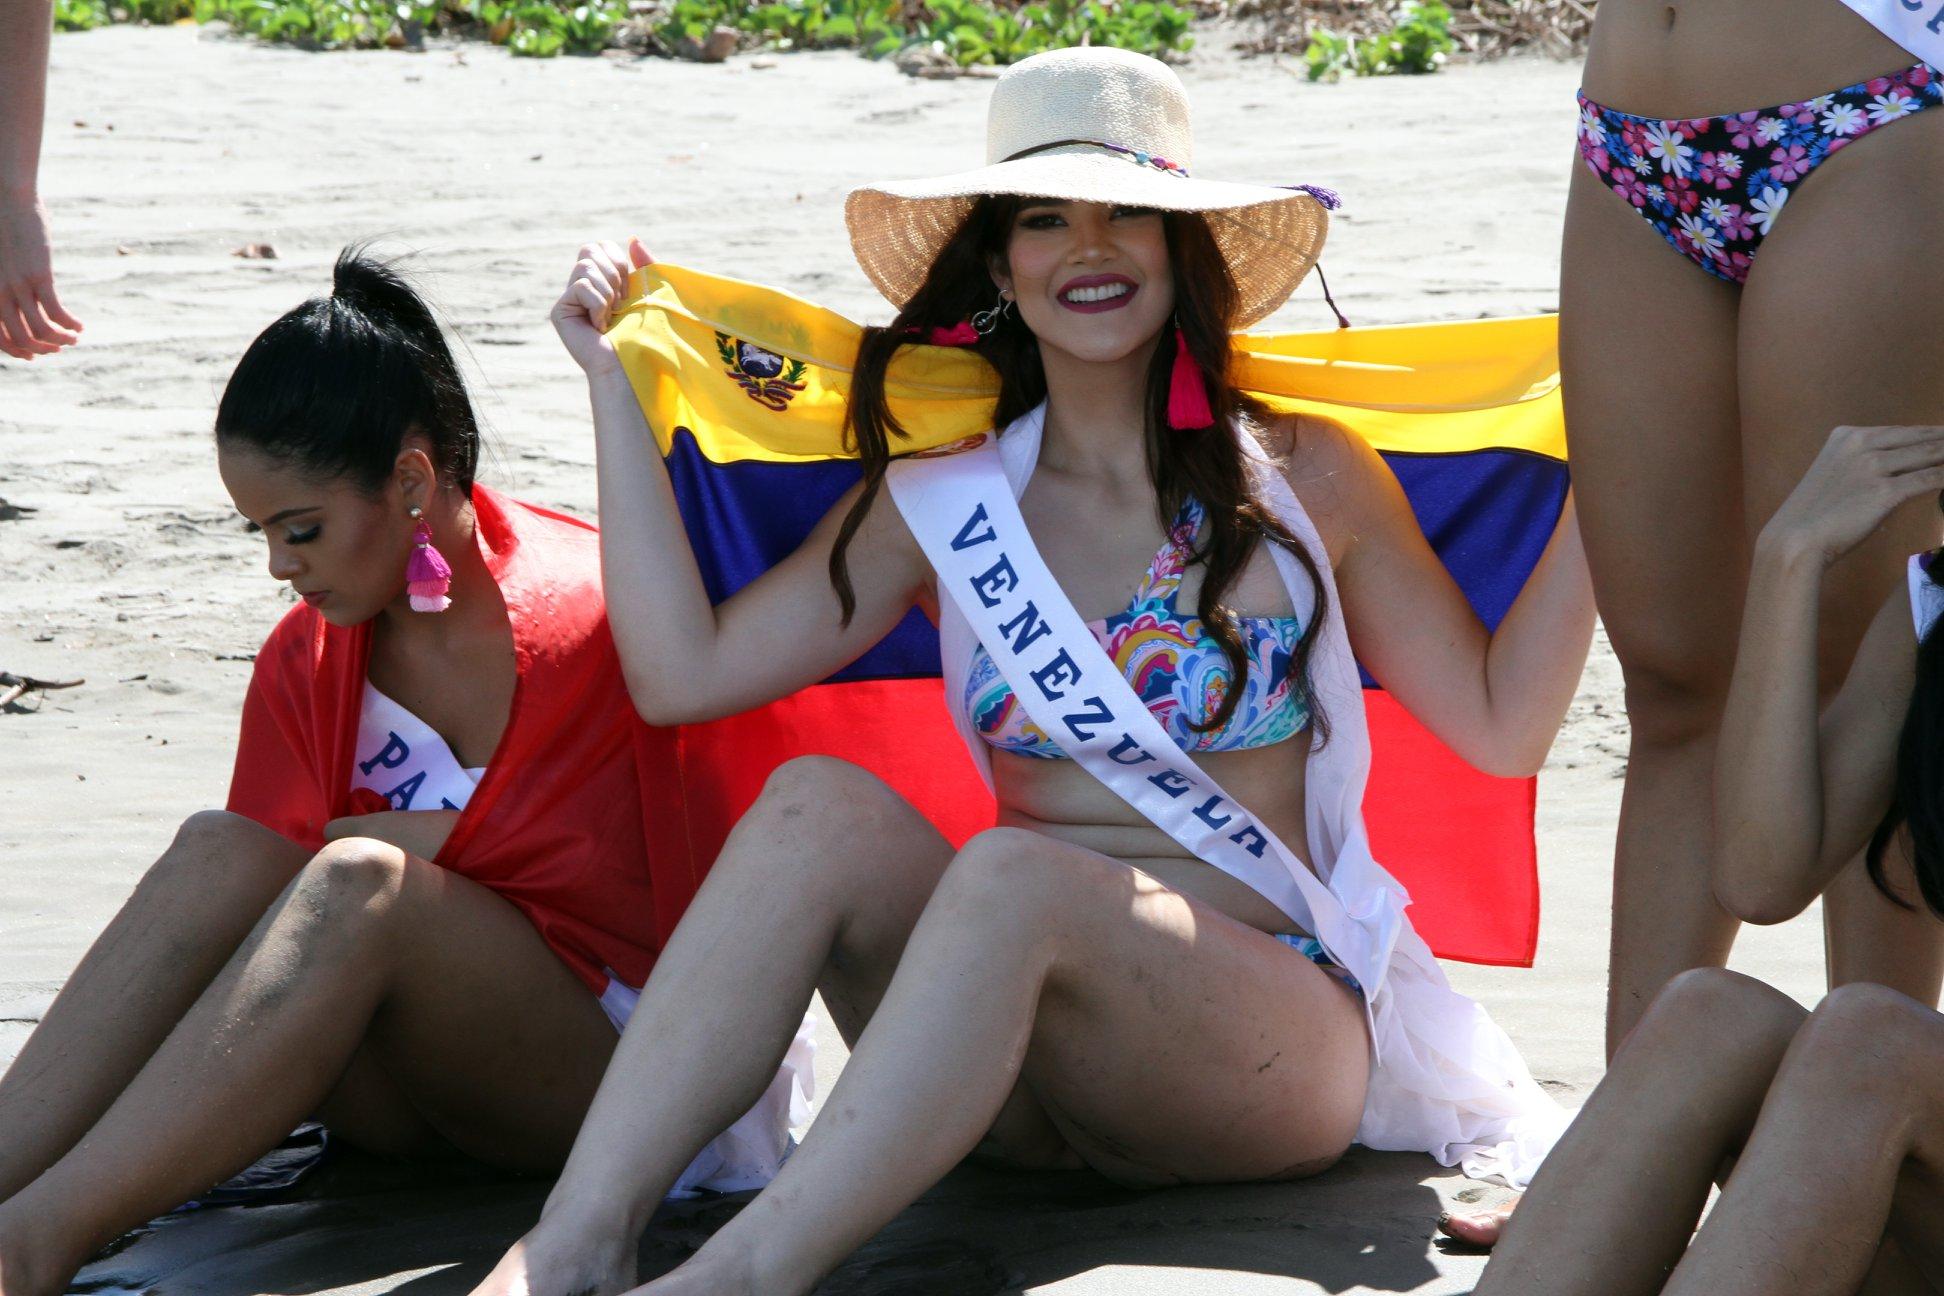 daniela di venere, top 12 de miss teen mundial 2019. - Página 4 61196010